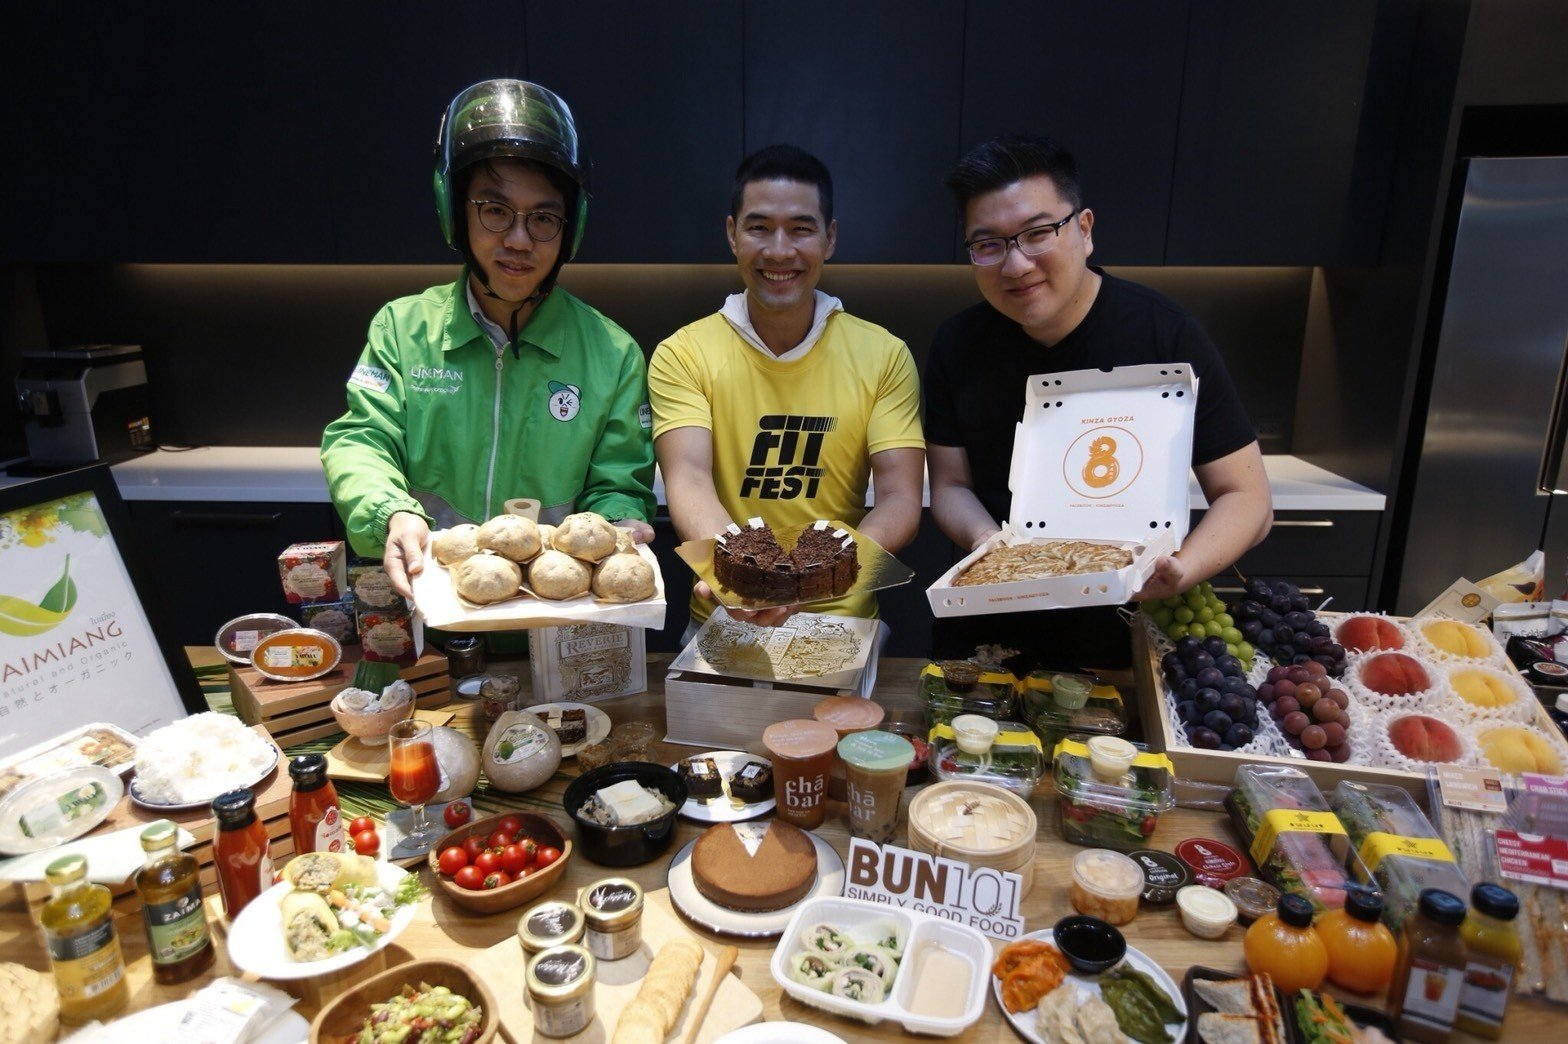 Wongnai x FitFest 2018 เปิดตัว FIT FEST Food Zone เอาใจสายเฮลท์ตี้